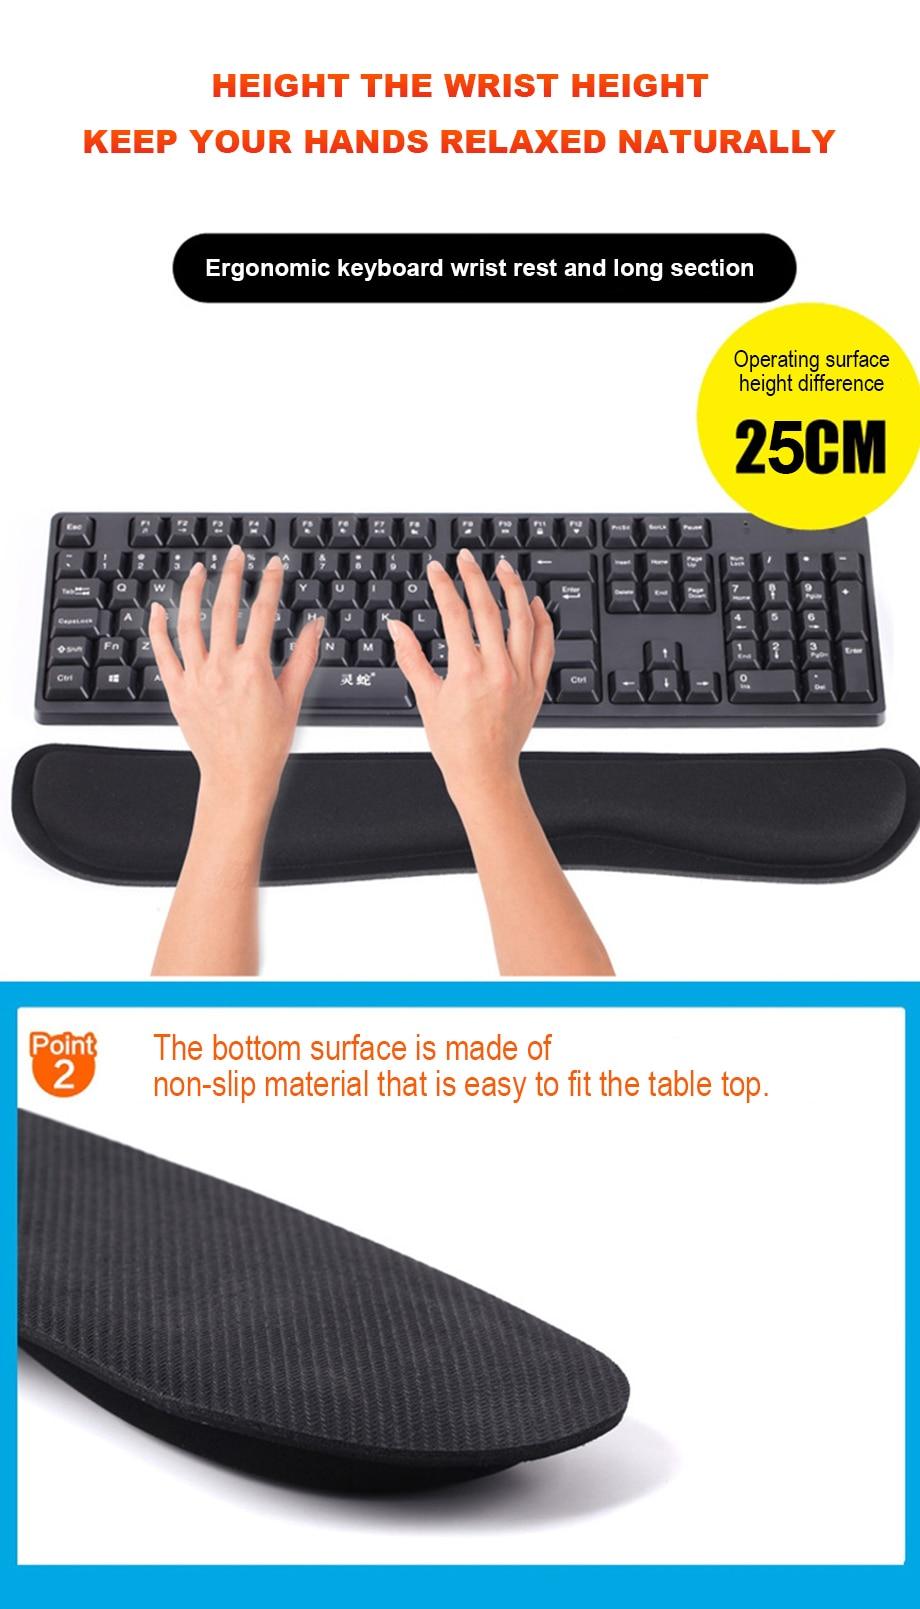 Wrist Guard Slow Rebound Memory Foam Keyboard Holder Three Colors, Color : Dark Blue Ergonomic Keyboard Pad Mouse Pad Bottom Surface Anti-Skid Wrist Pad//Wrist Holder